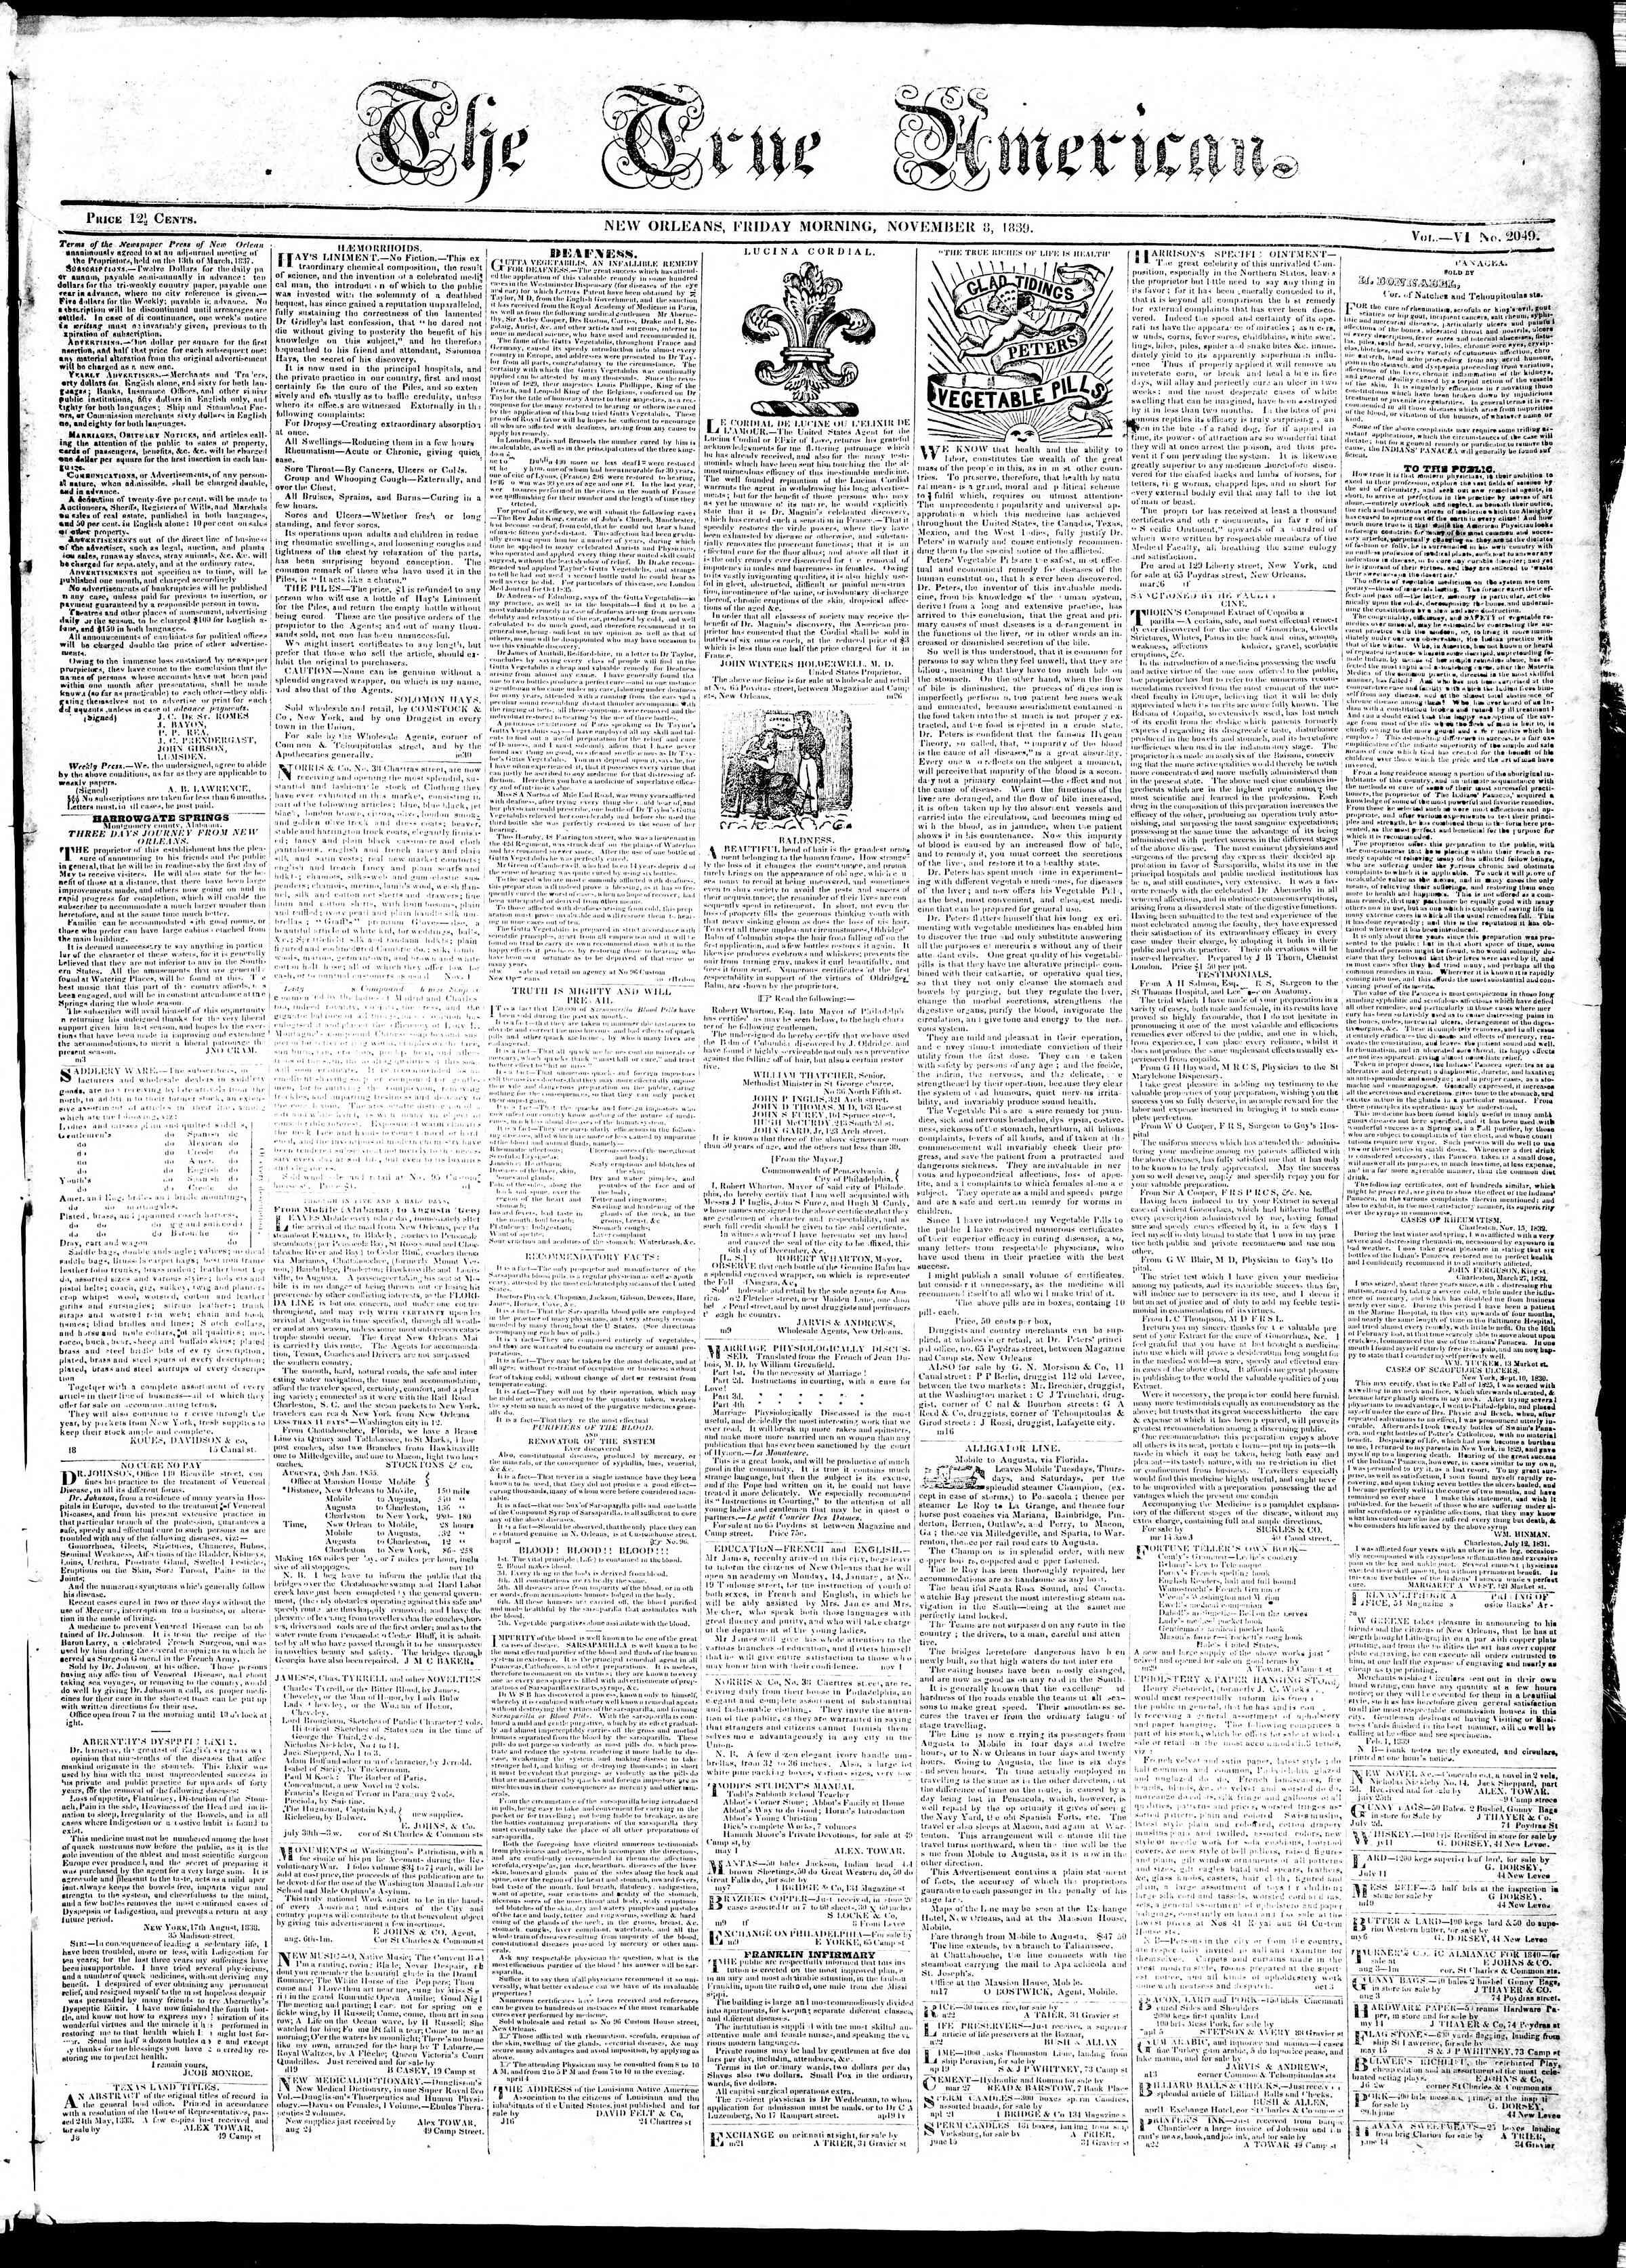 November 8, 1839 Tarihli True American Gazetesi Sayfa 1